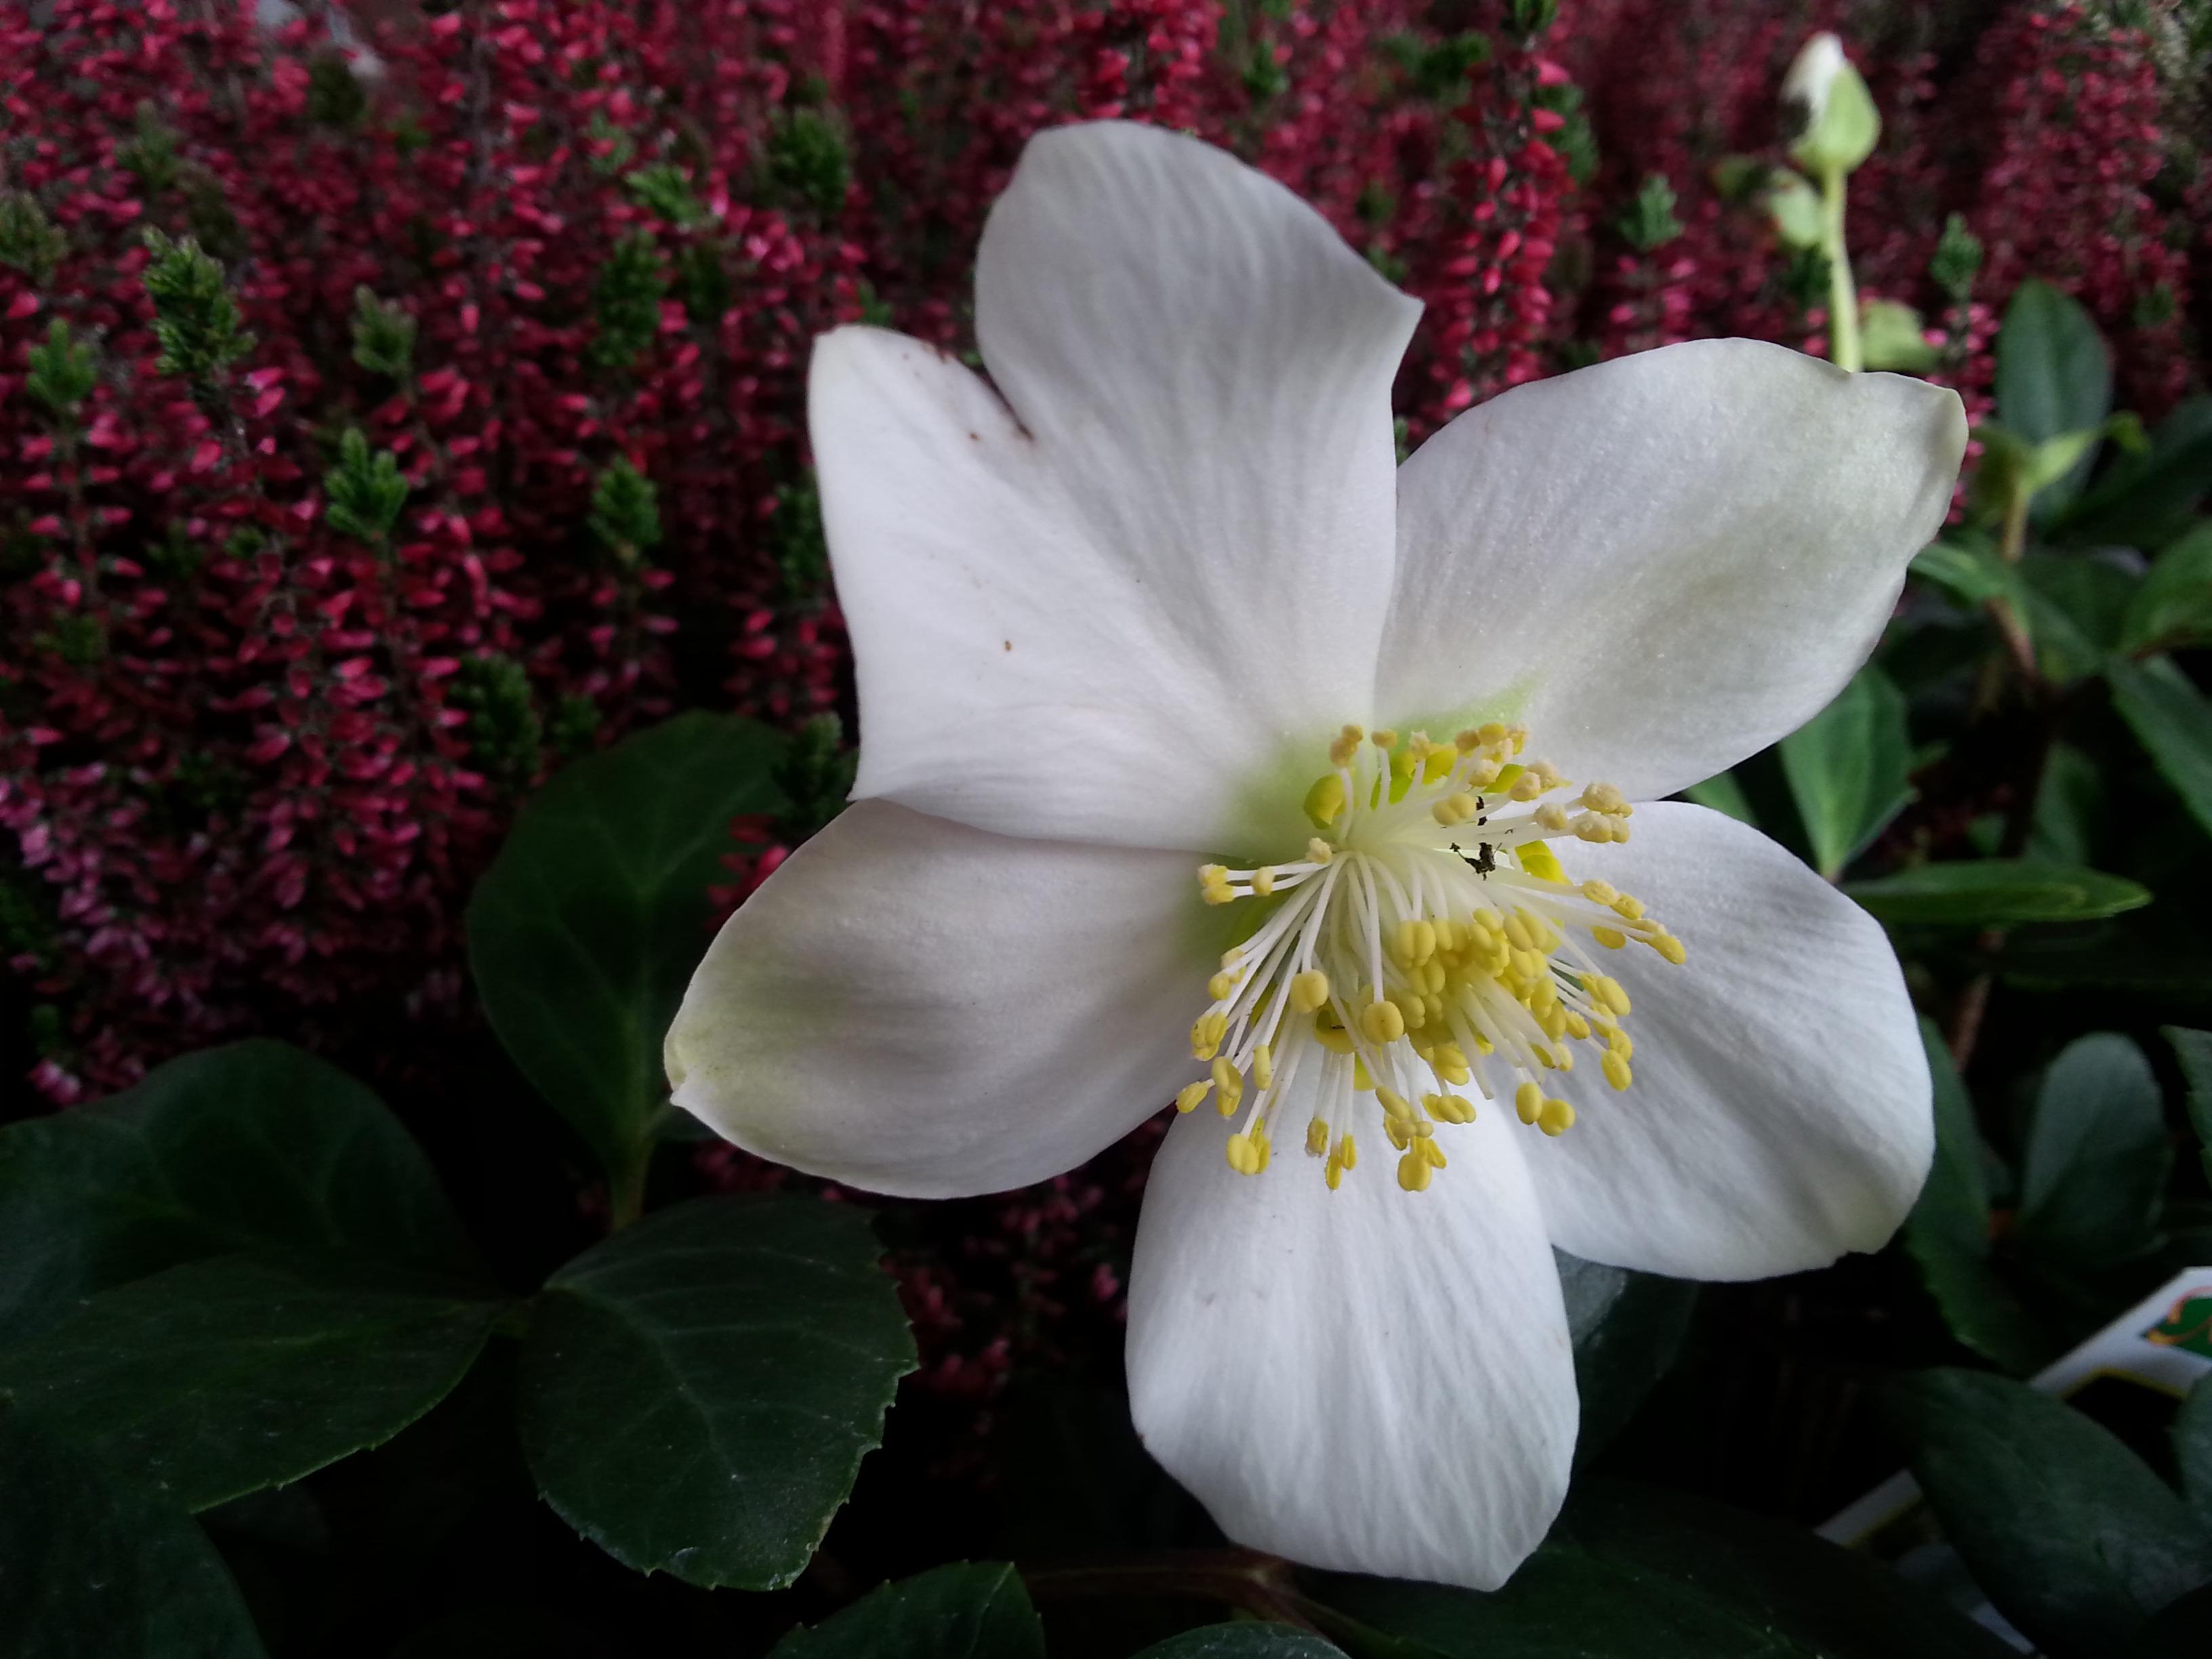 Free Images Blossom Petal Botany Flora White Flower